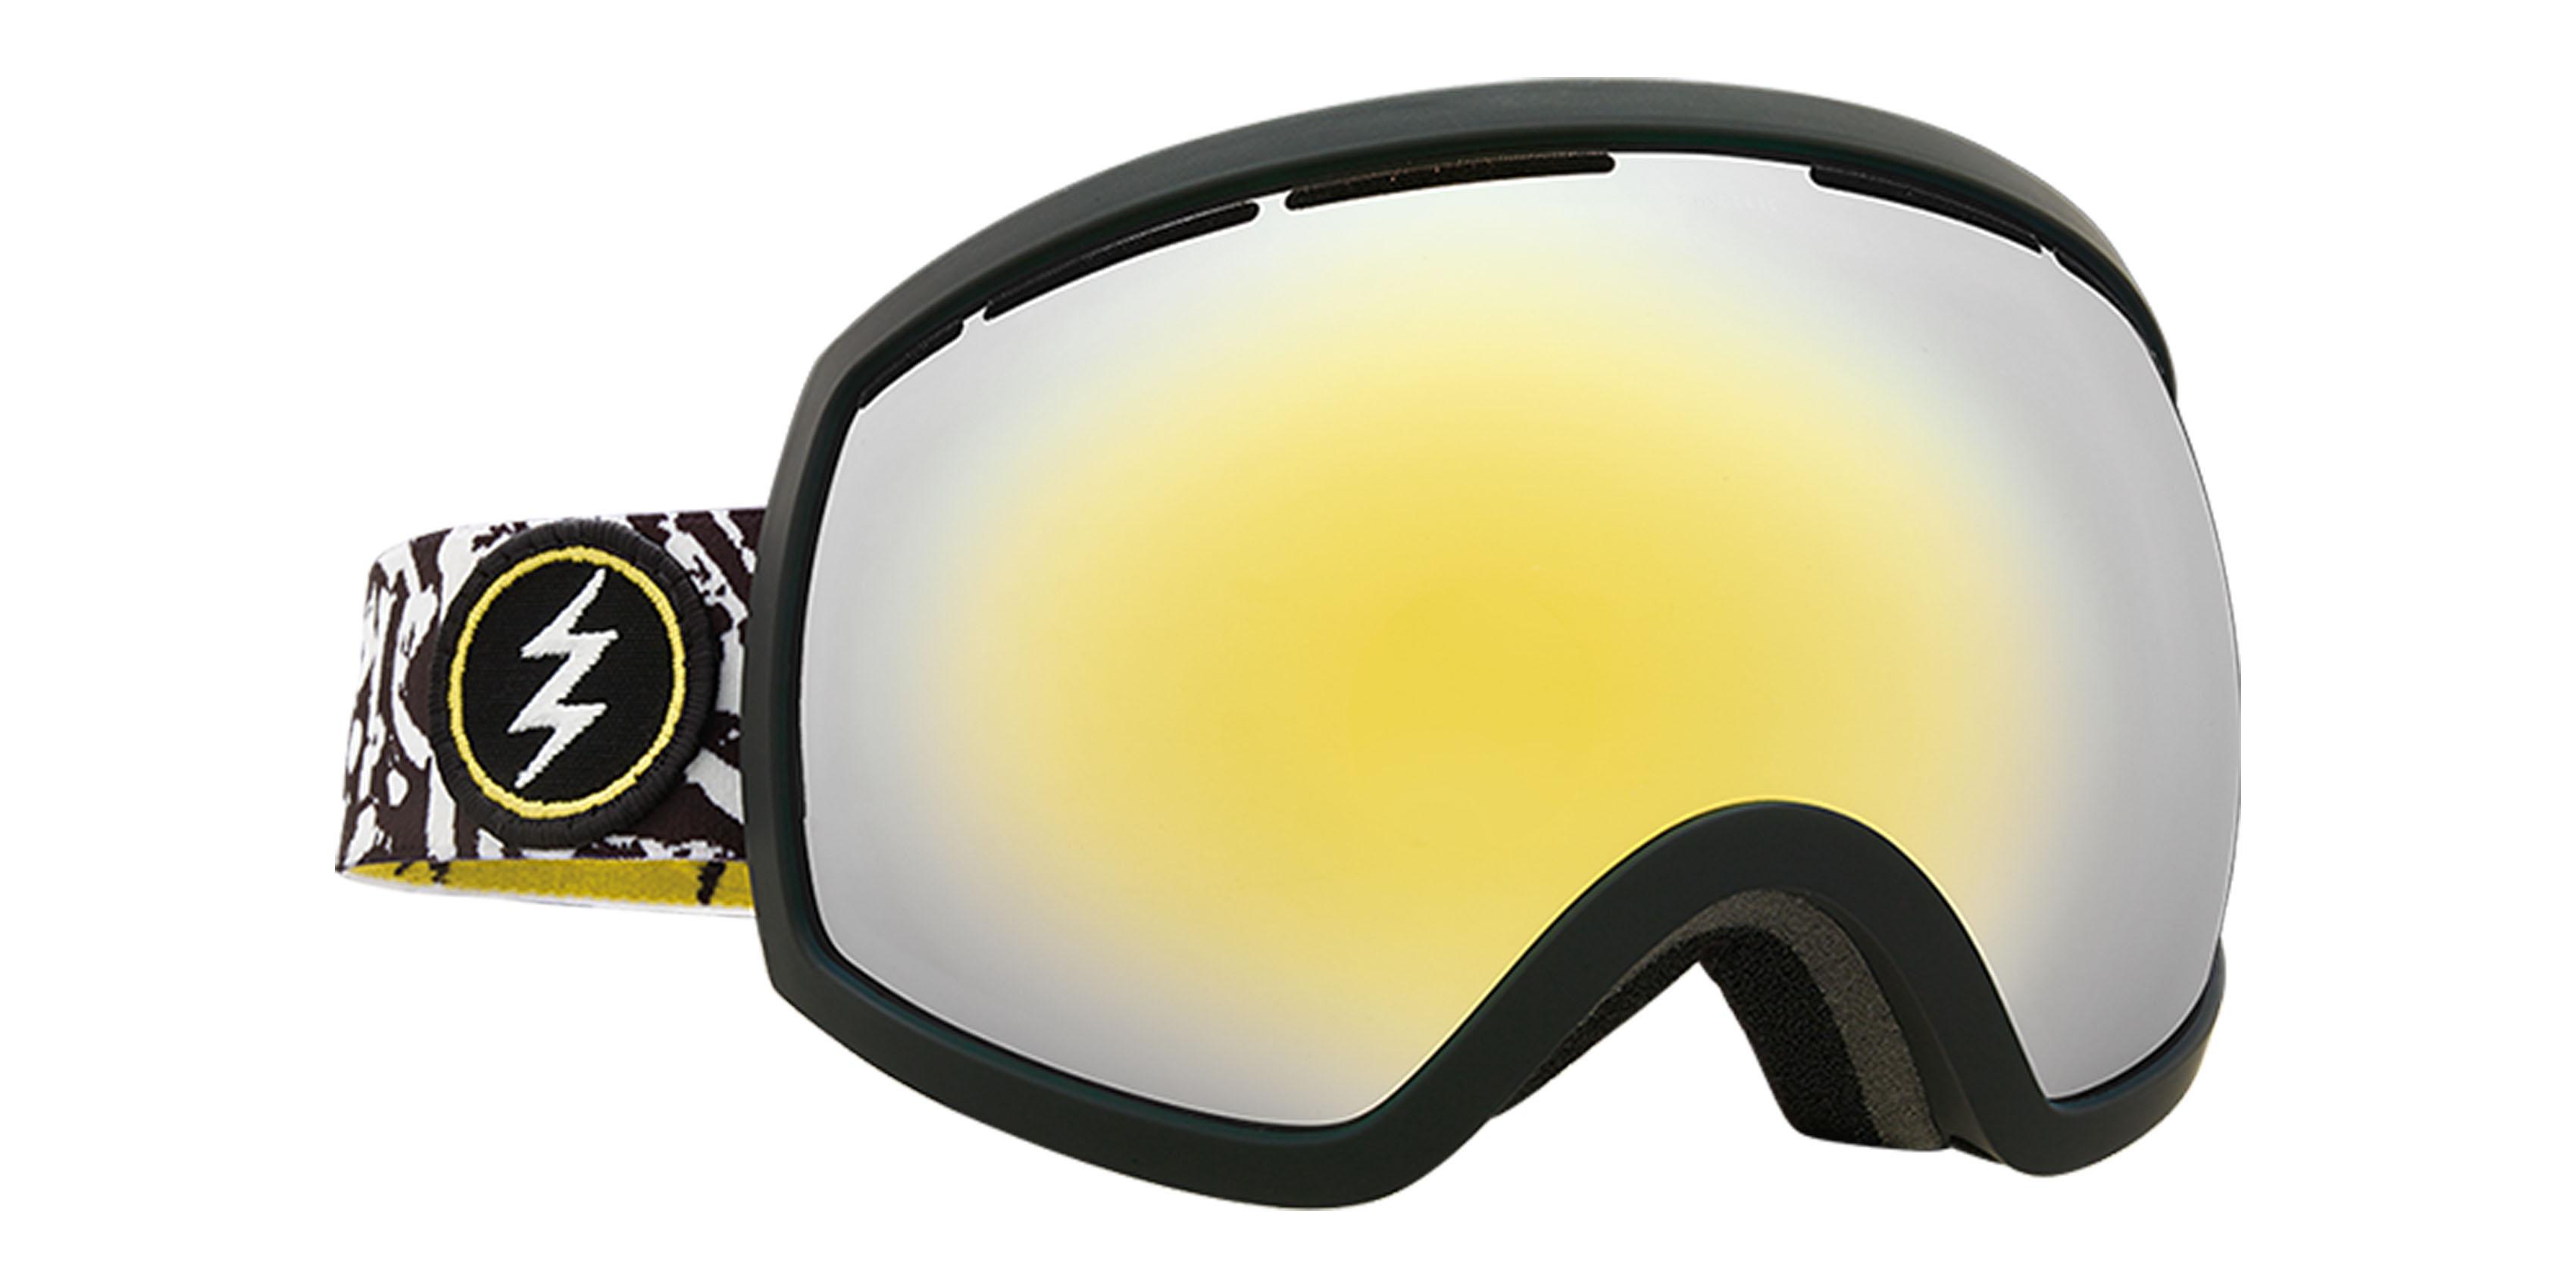 79c22662258 Electric EG2 Snowboard Goggles 2018 - Bones w Brose Gold Chrome + Bonus  Choice Lens